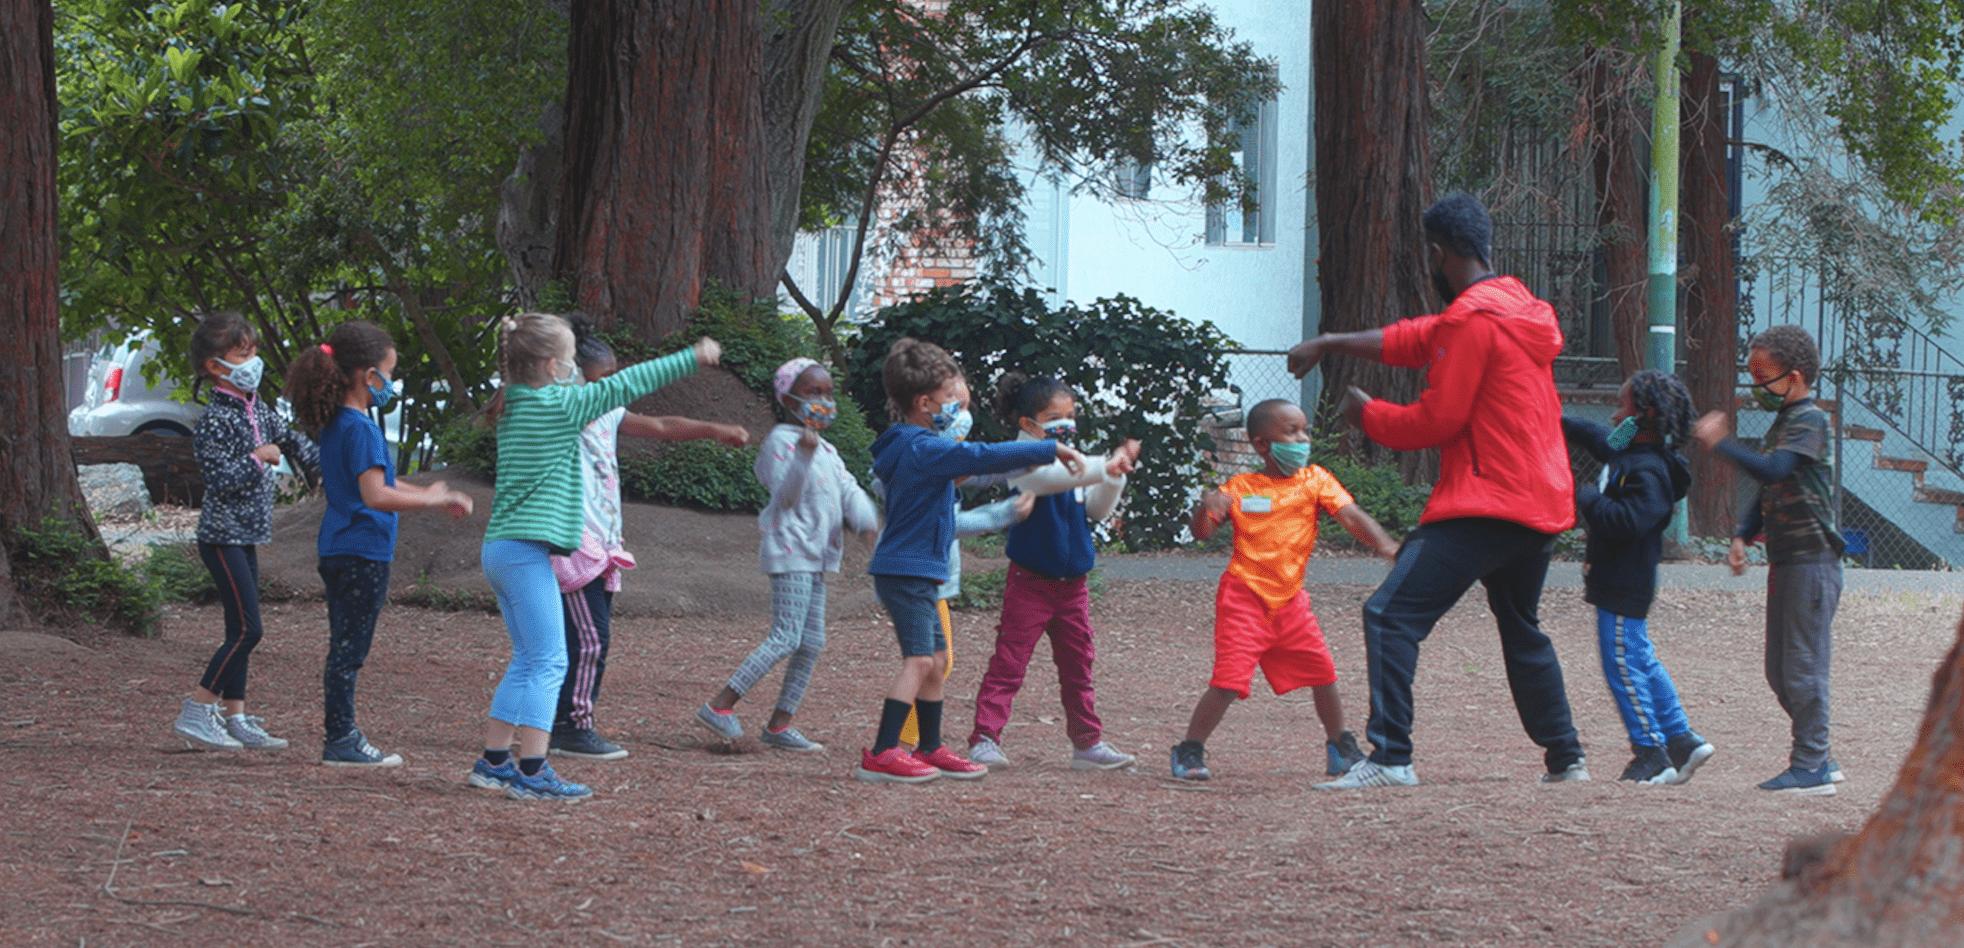 Martial Arts Program Creates Community, Confidence in Children